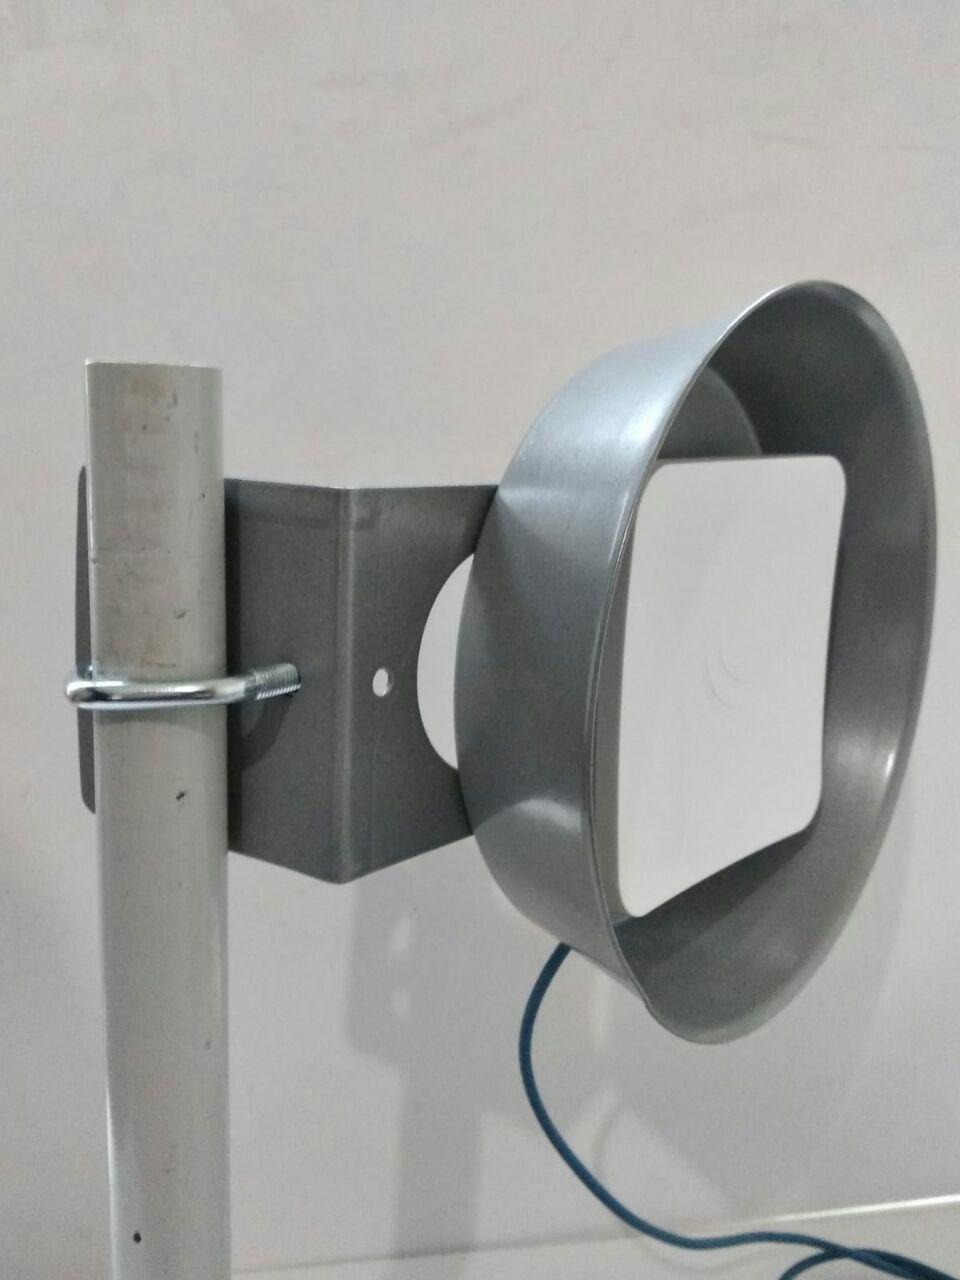 WINET-SQ-KALKAN SXT RF Sinyal Kalkanı - SQ KALKANI Mikrotik için